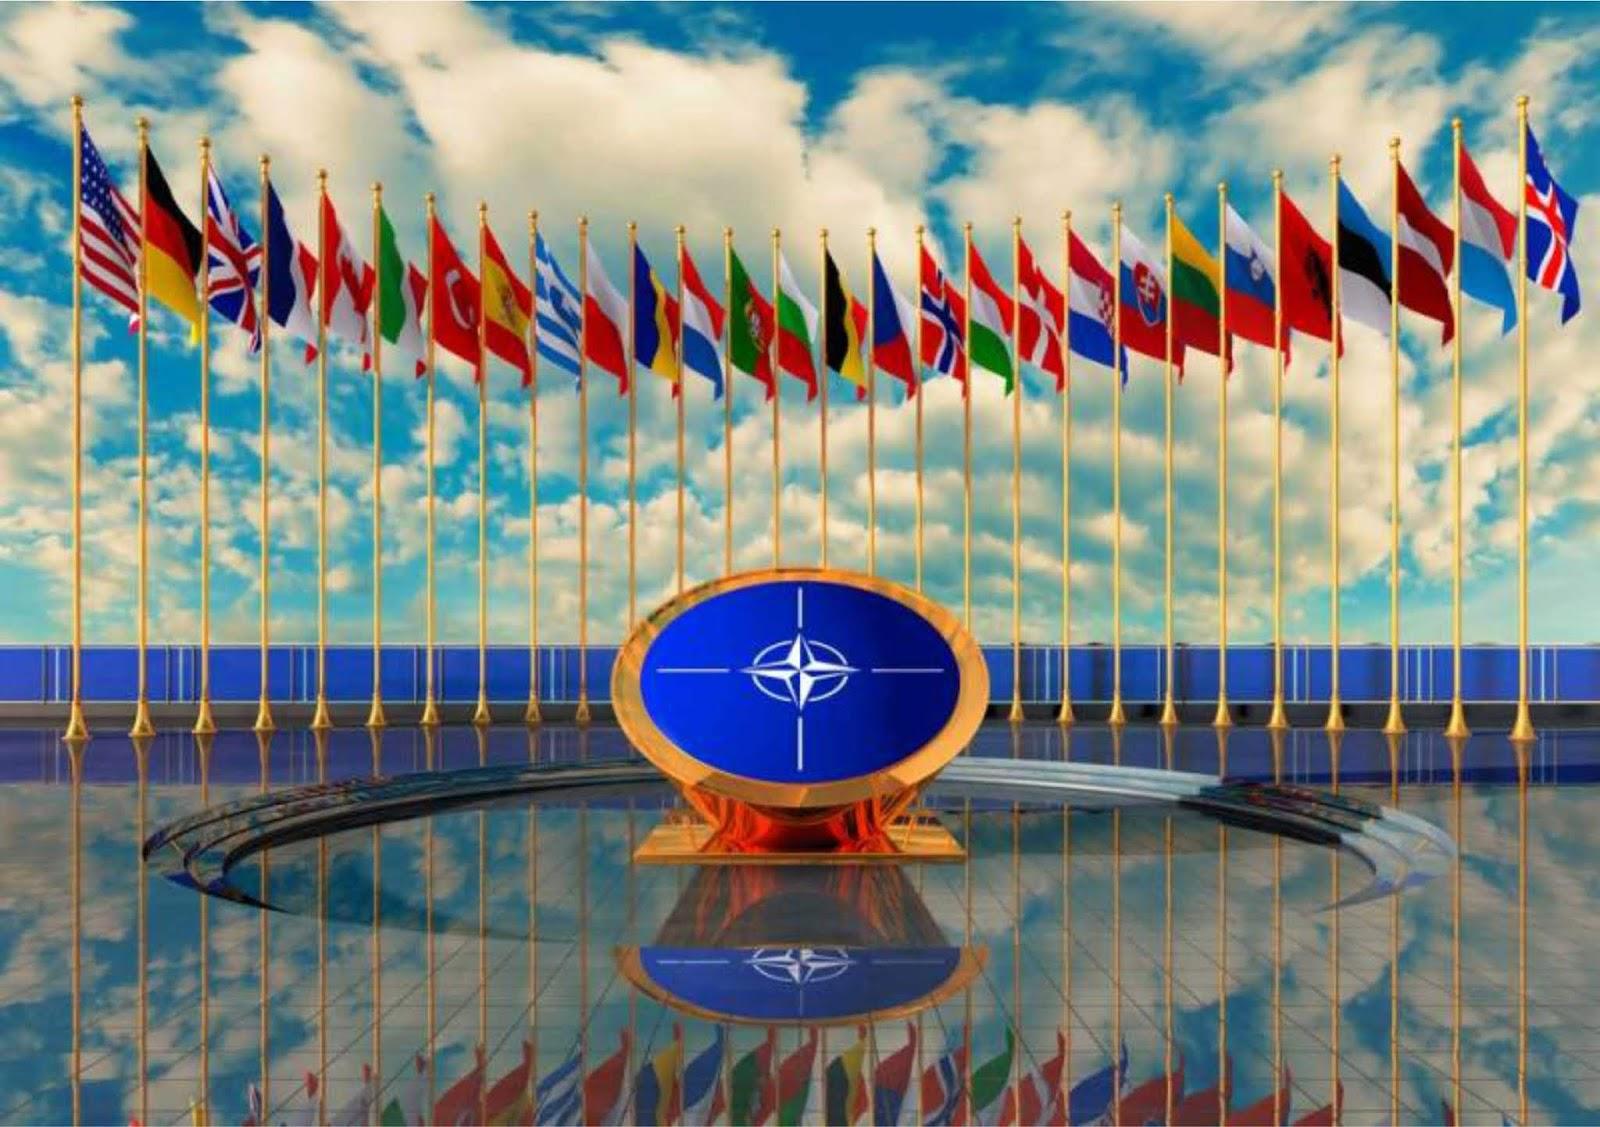 Uni Eropa seharusnya tidak menciptakan perlombaan dengan NATO dalam masalah pertahanan